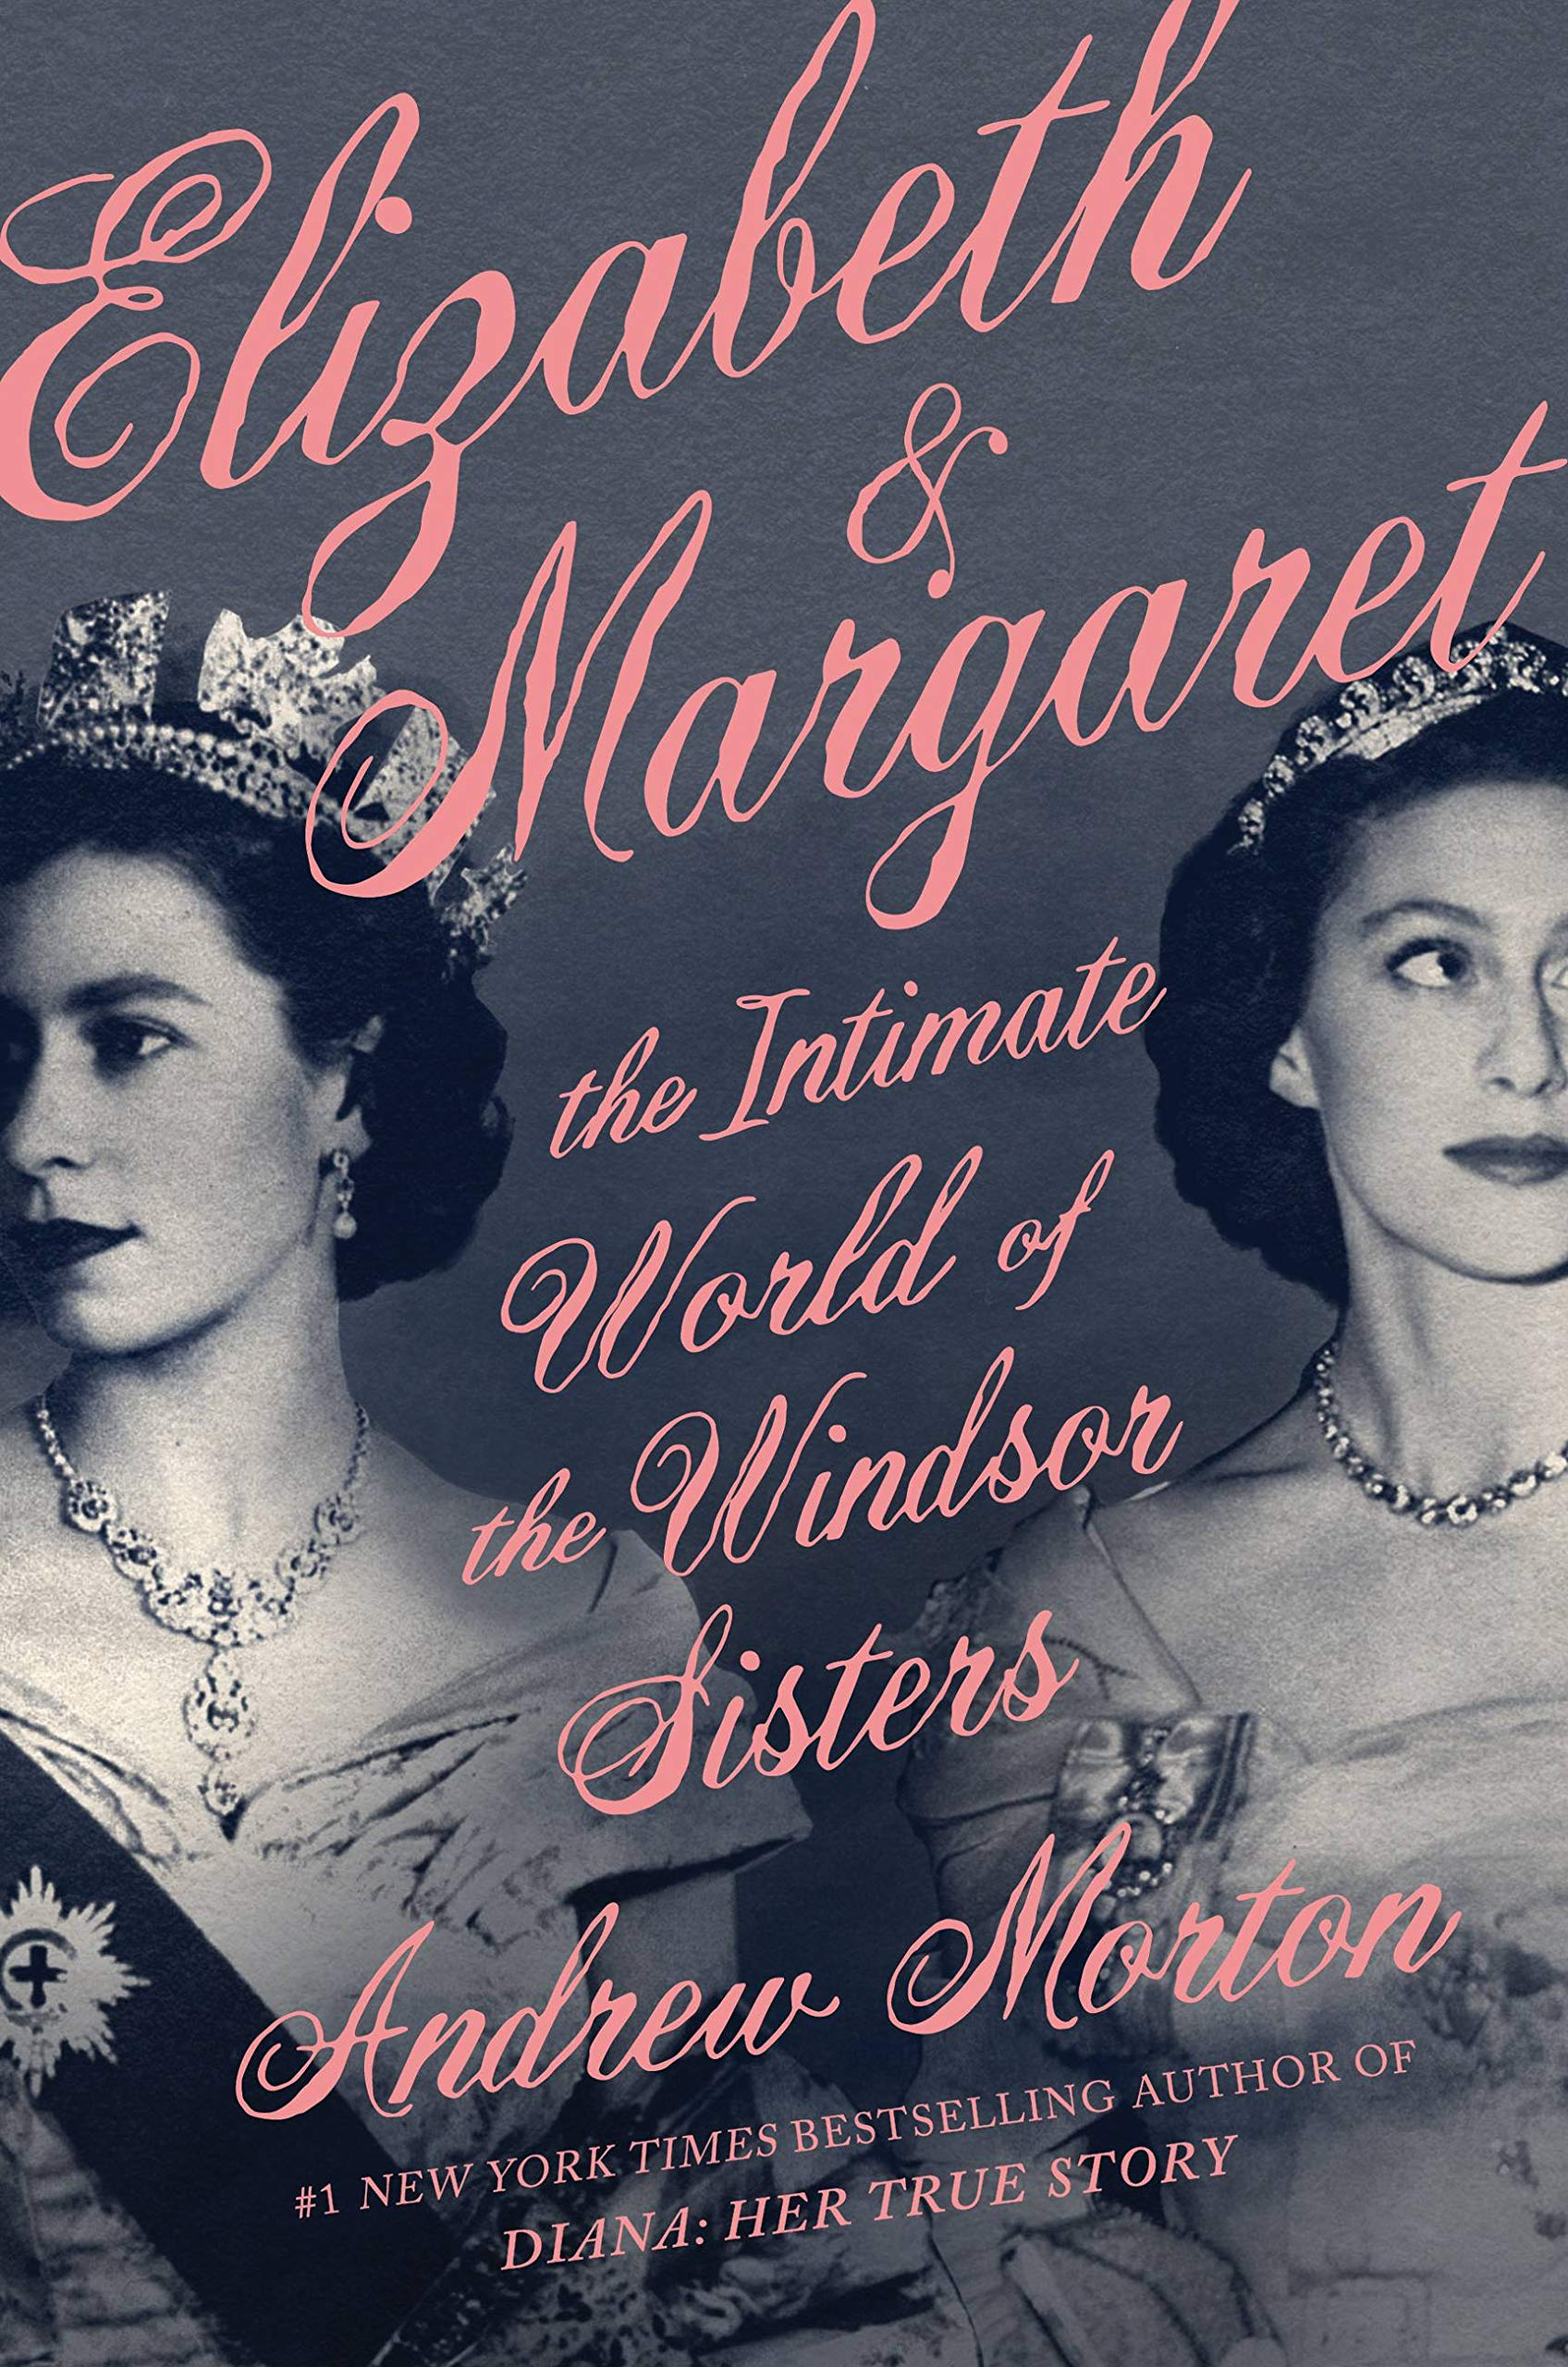 Amazon.com: Elizabeth & Margaret: The Intimate World of the Windsor Sisters  (9781538700464): Morton, Andrew: Books